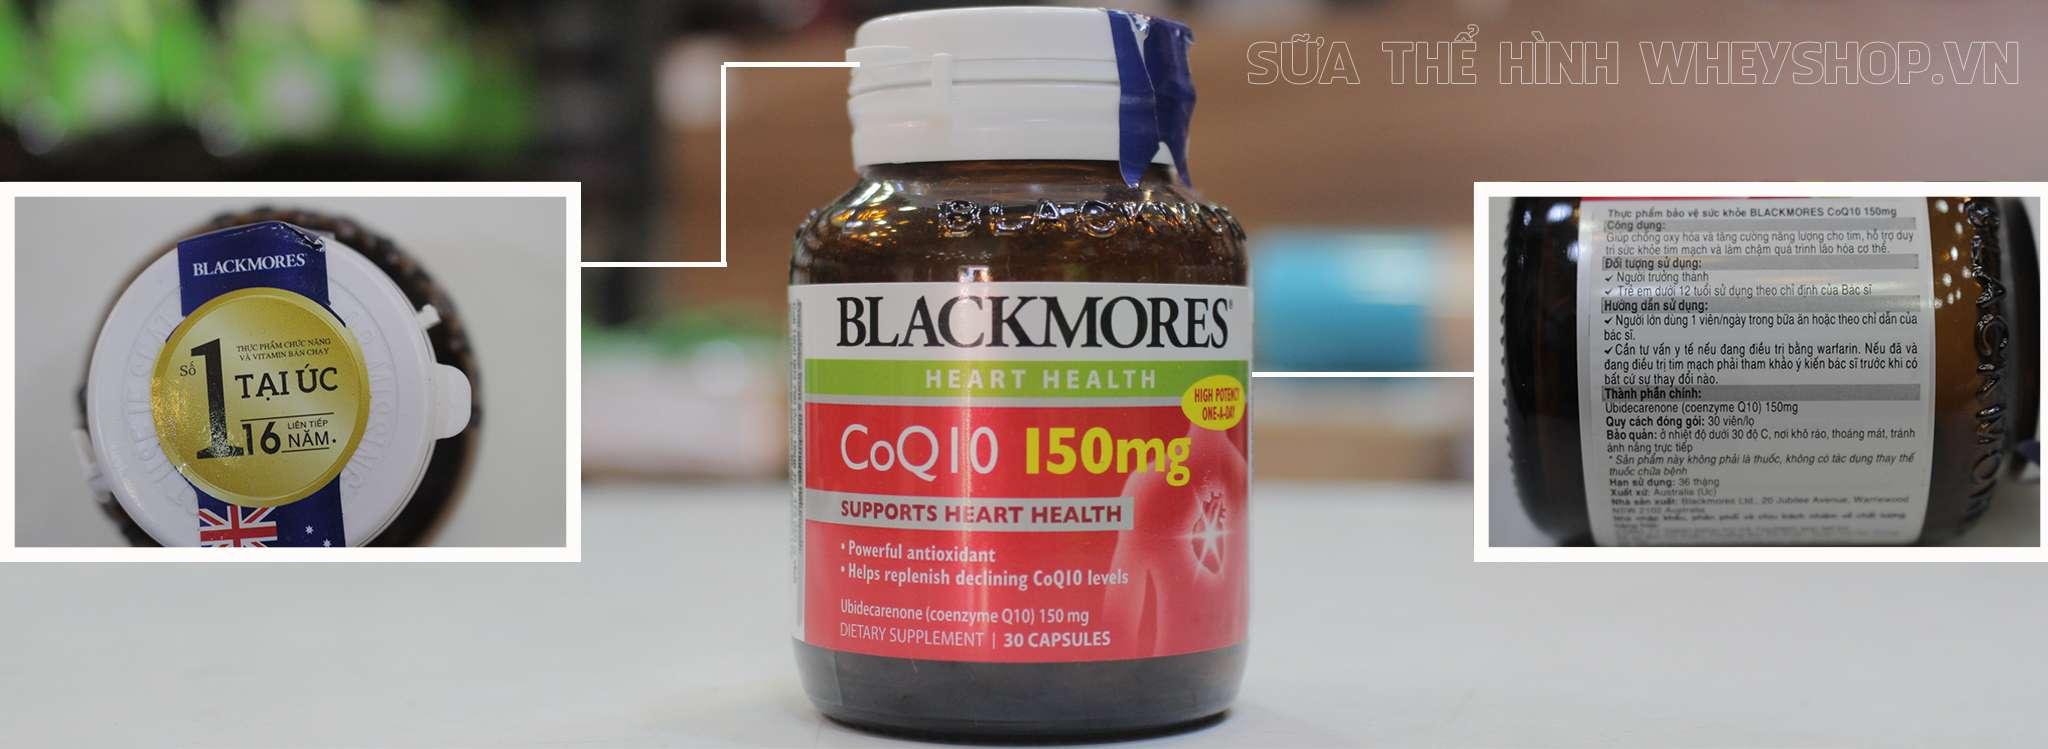 Blackmores CoQ10 150mg 30 vien tem nhan hieu chinh hang tai wheyshop